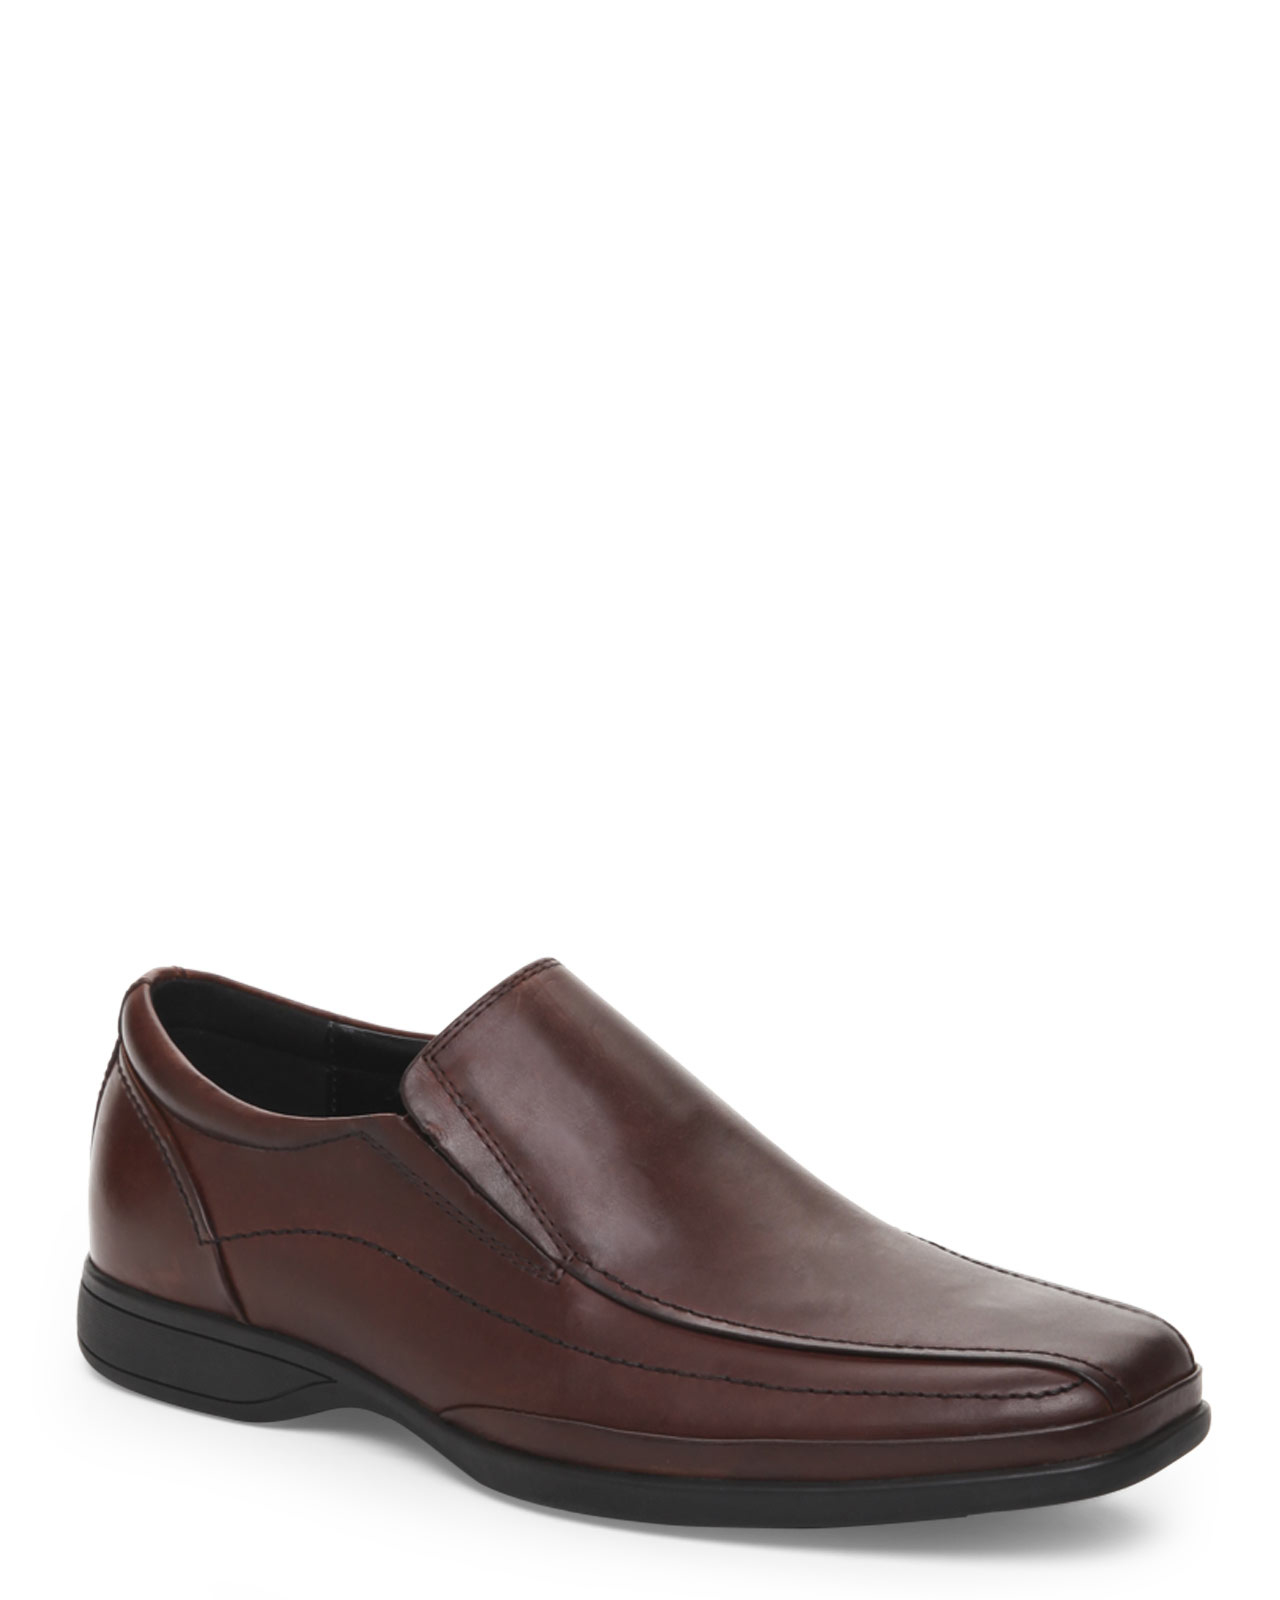 Fumagalli Dress Shoes